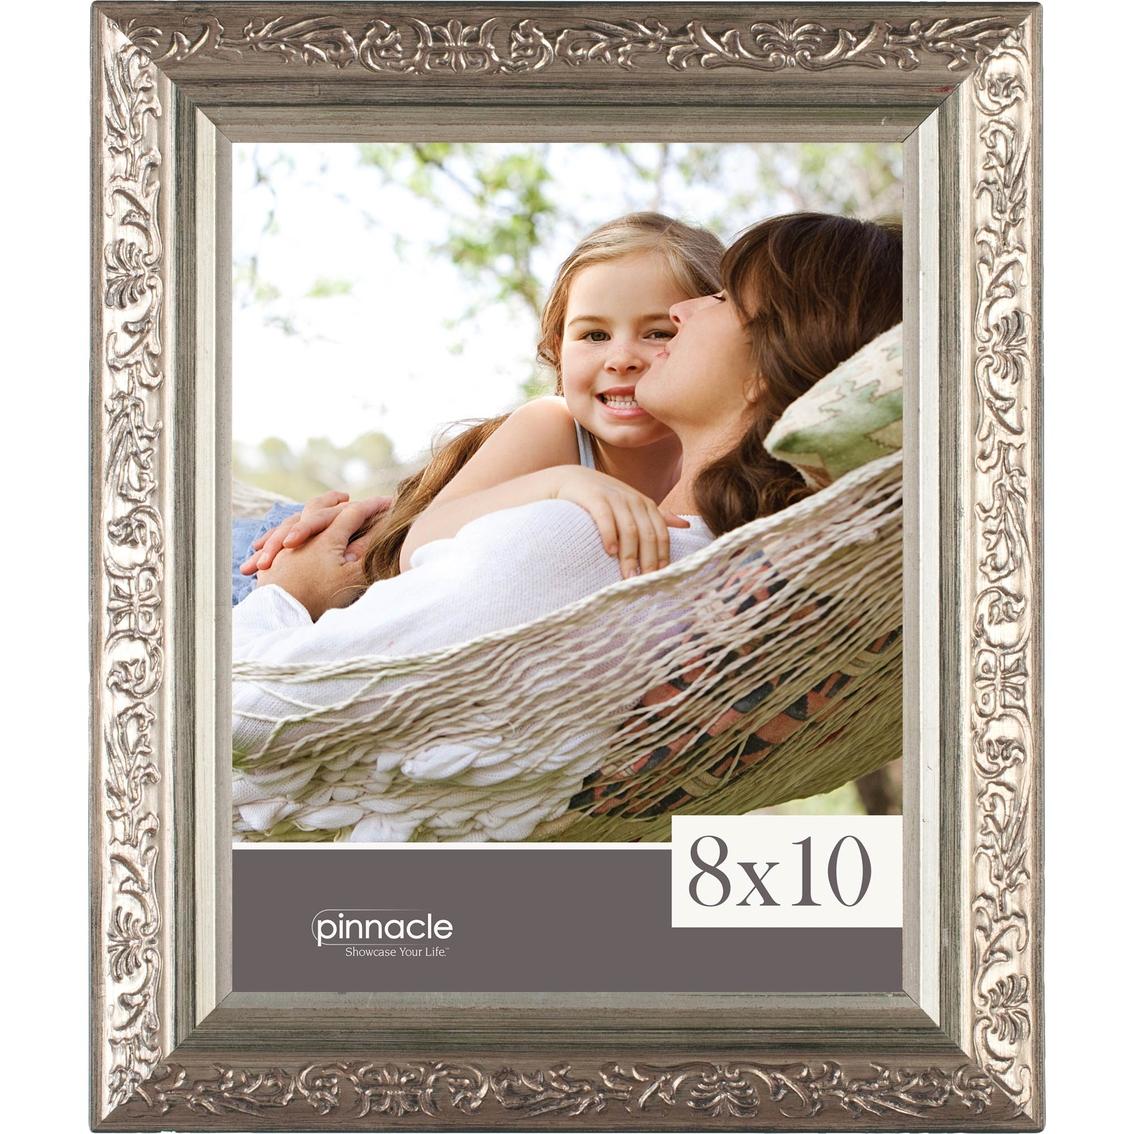 Pinnacle champagne ornate frame frames home appliances pinnacle champagne ornate frame jeuxipadfo Choice Image